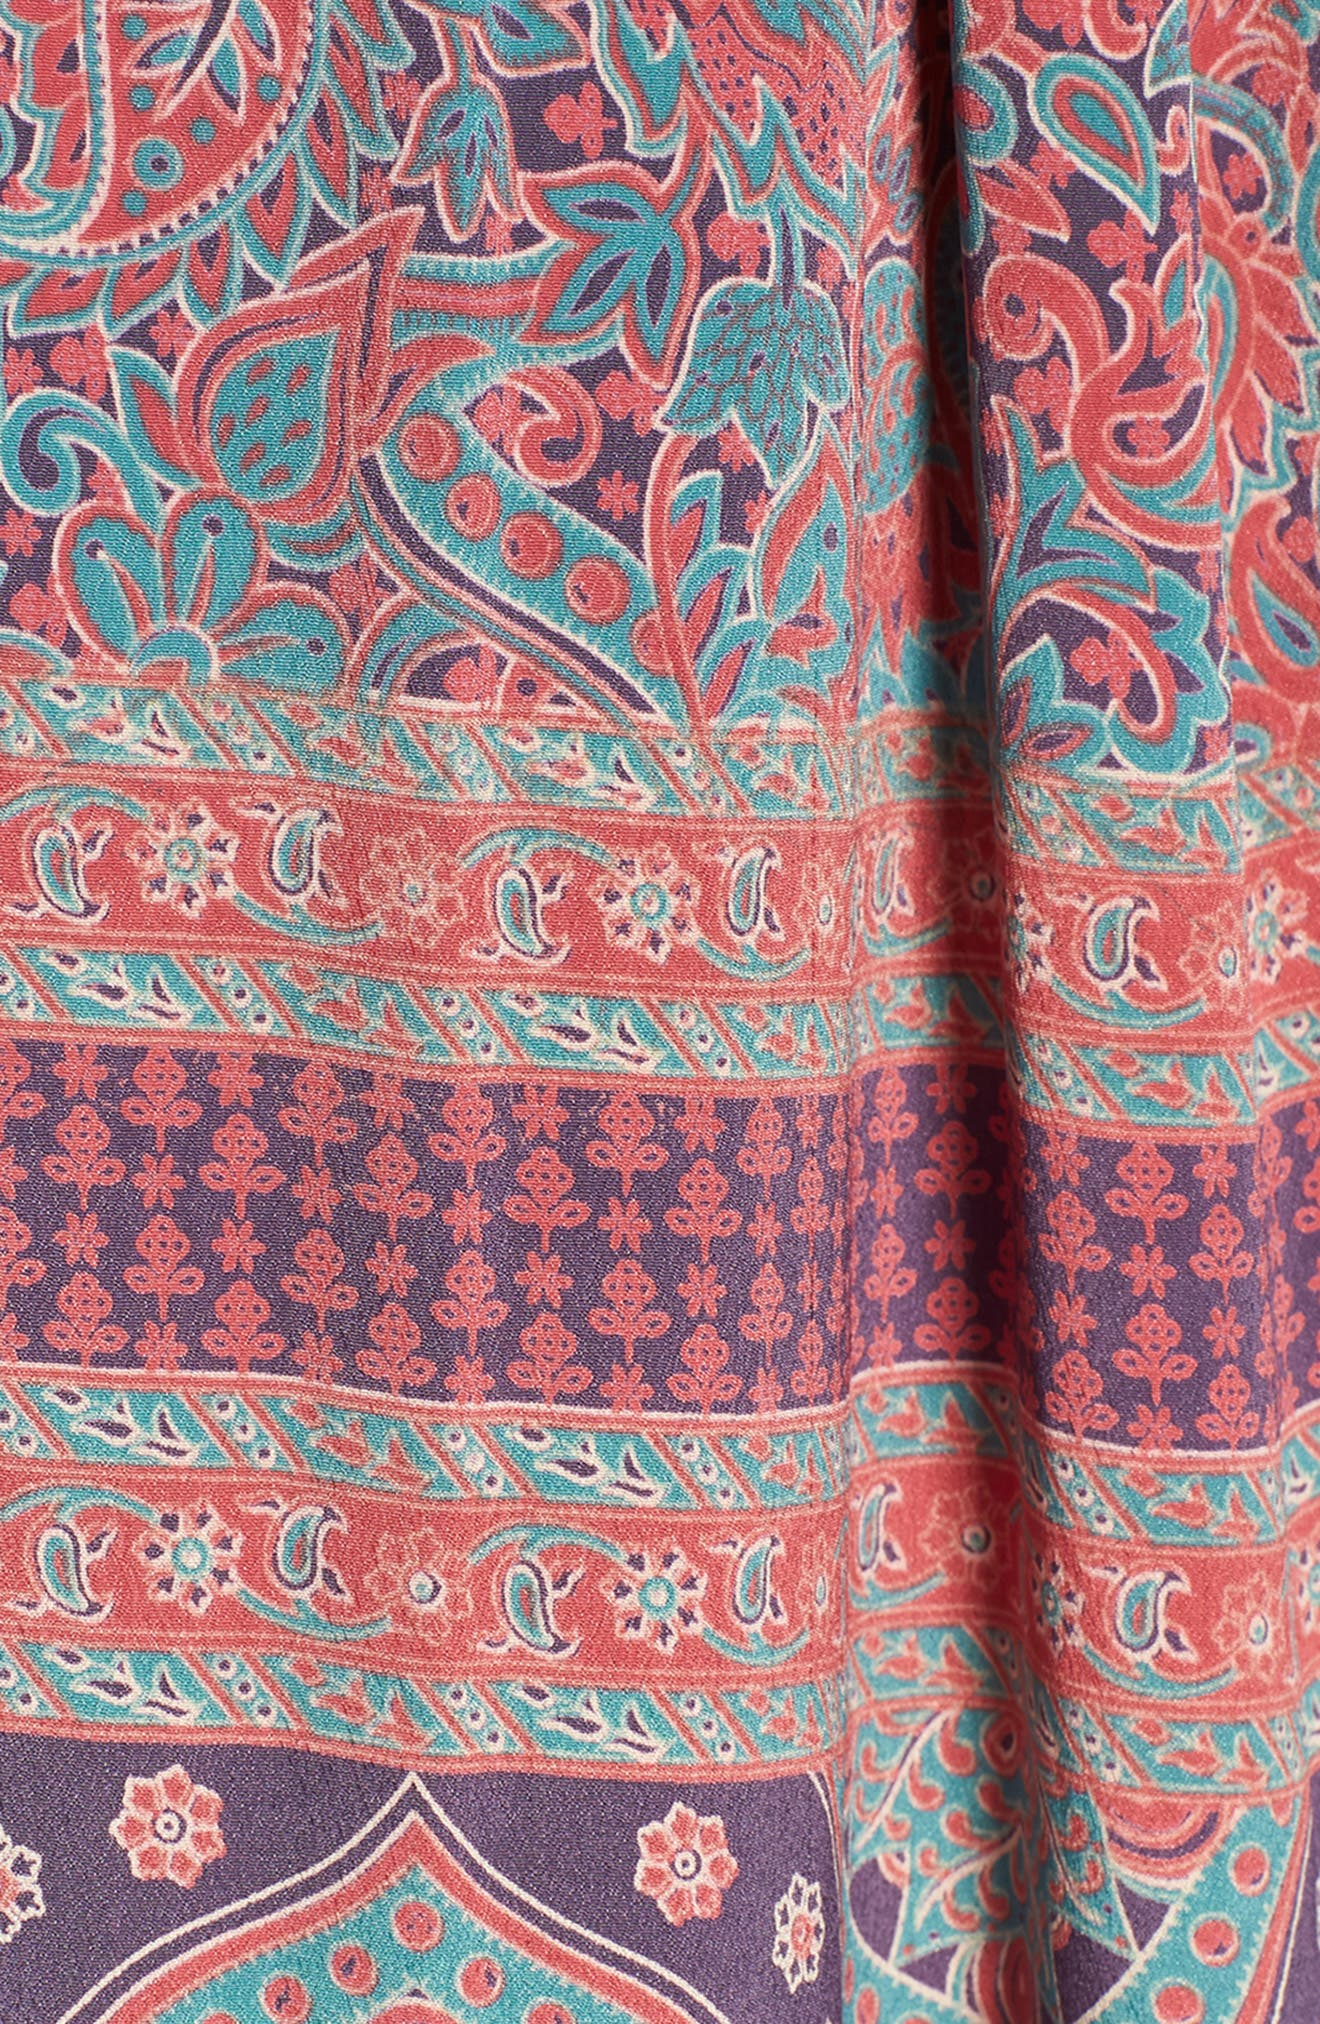 Electric Love Maxi Dress,                             Alternate thumbnail 6, color,                             MULTI